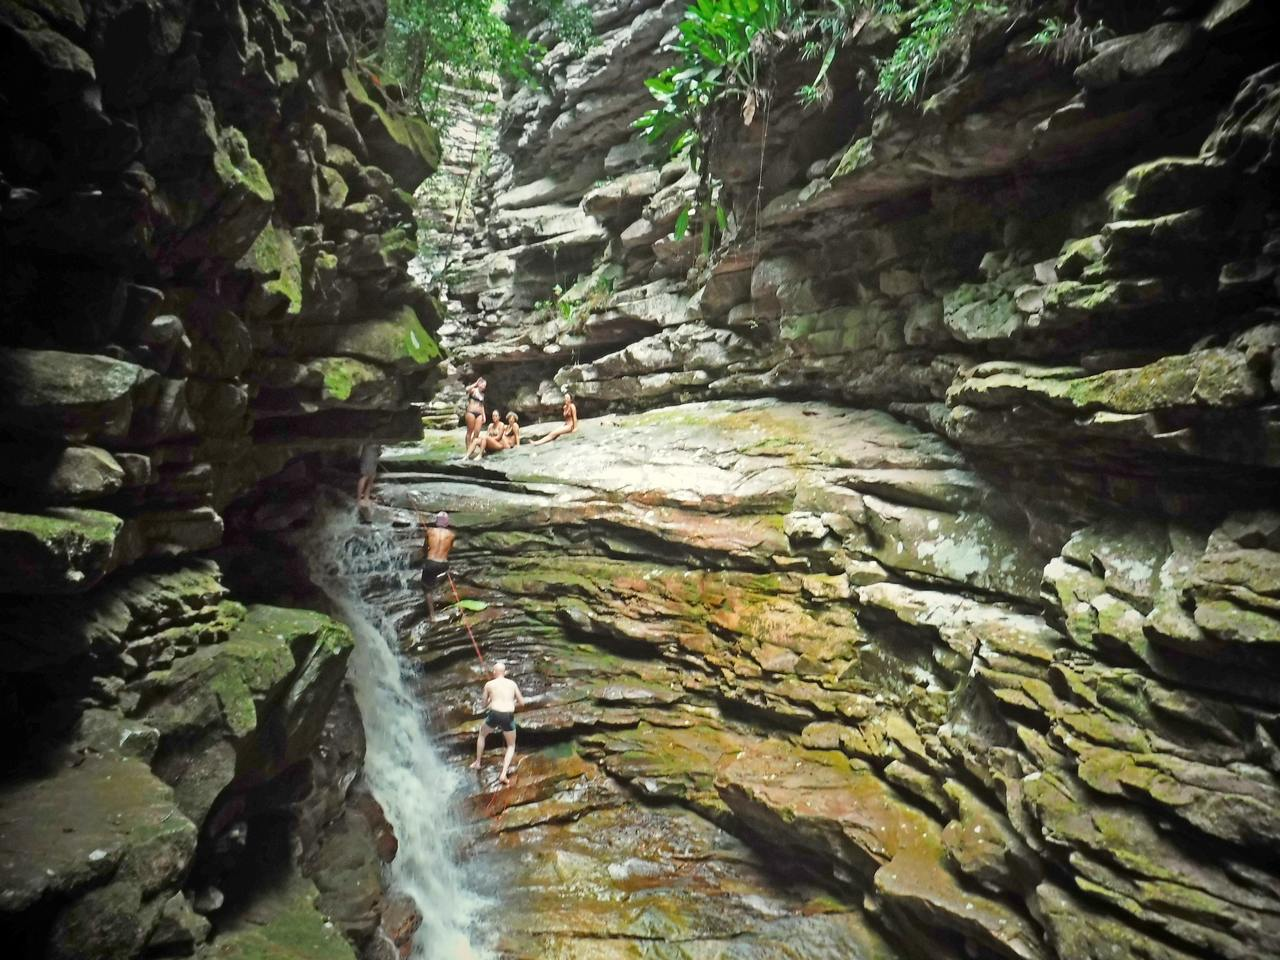 Cachoeira da Mixila, Canyon, Chapada Diamntina, Bahia, Brazil (4)